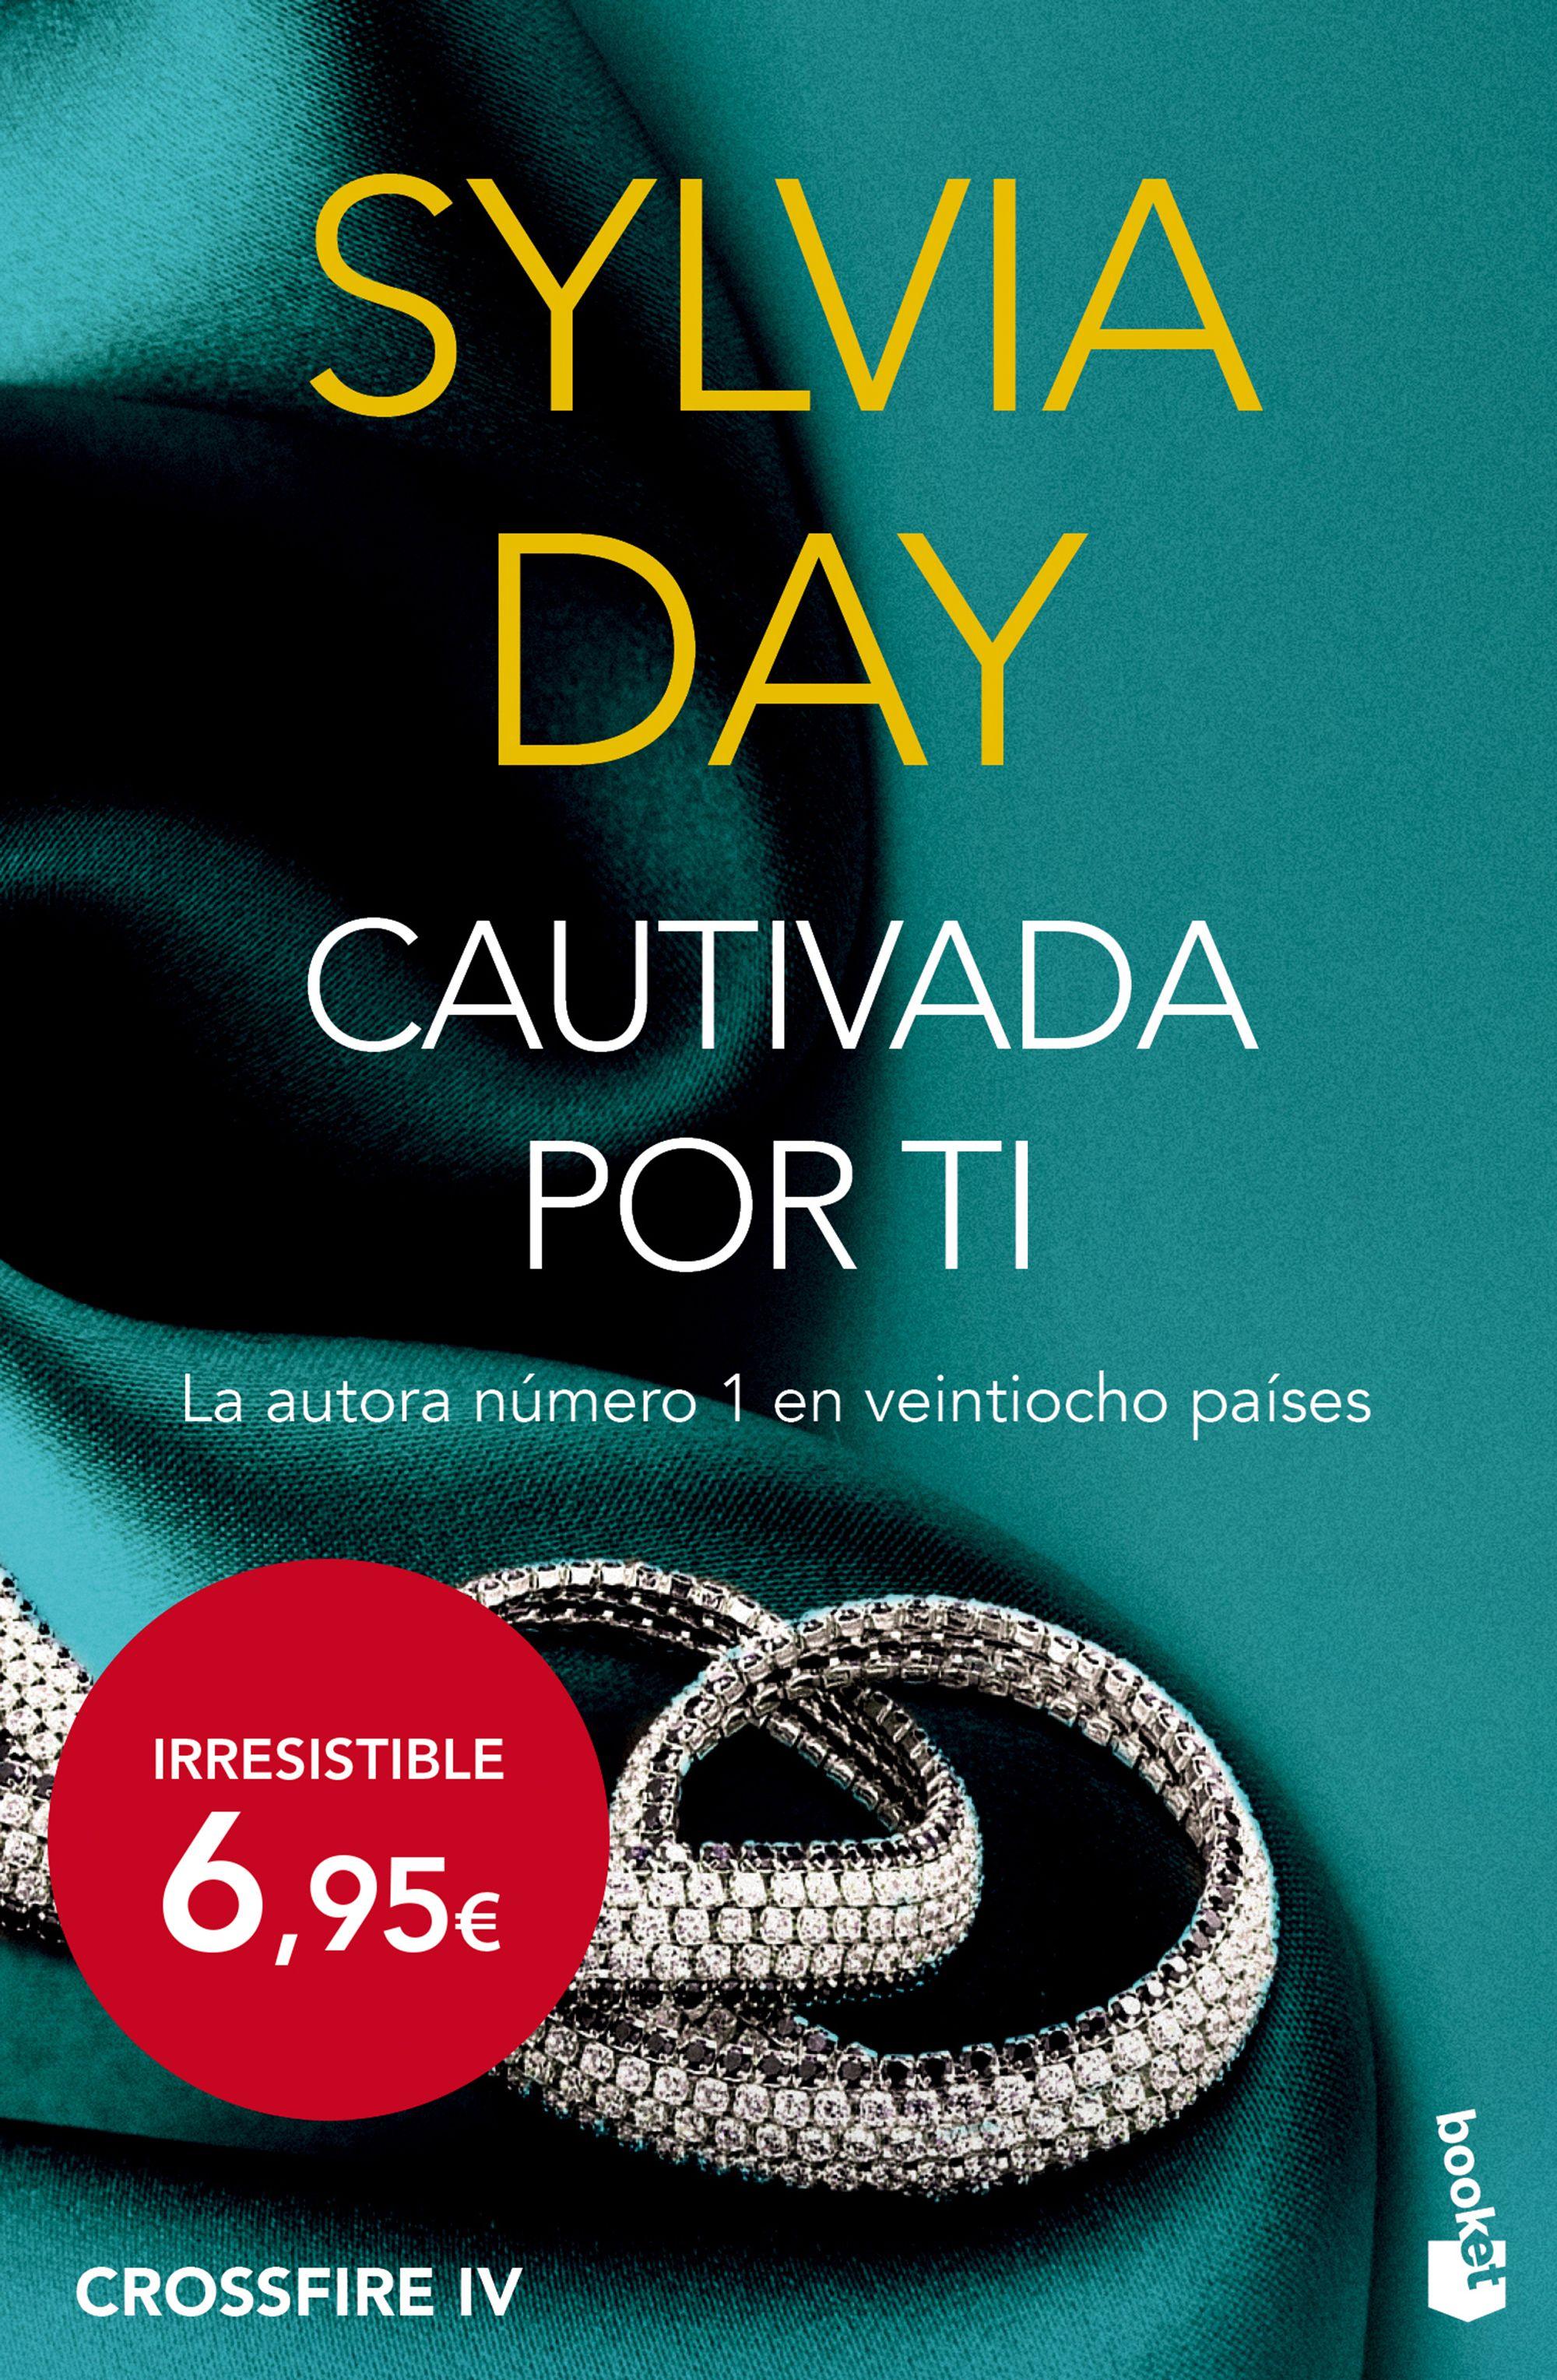 CAUTIVADA POR TI (CROSSFIRE IV) EBOOK | SYLVIA DAY ...